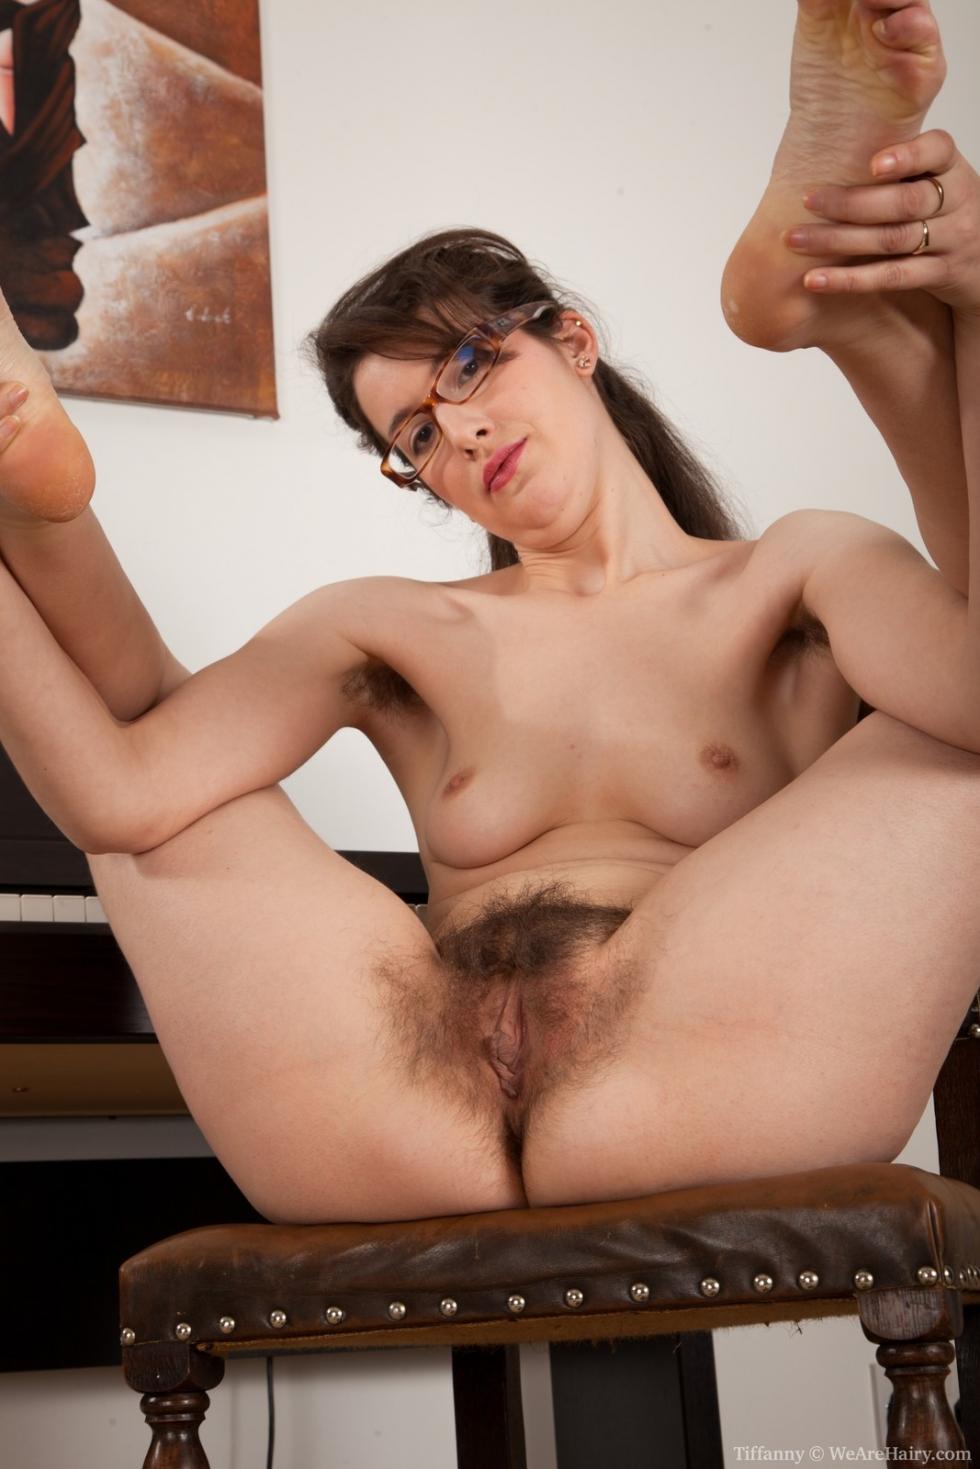 Hourglass figure porn